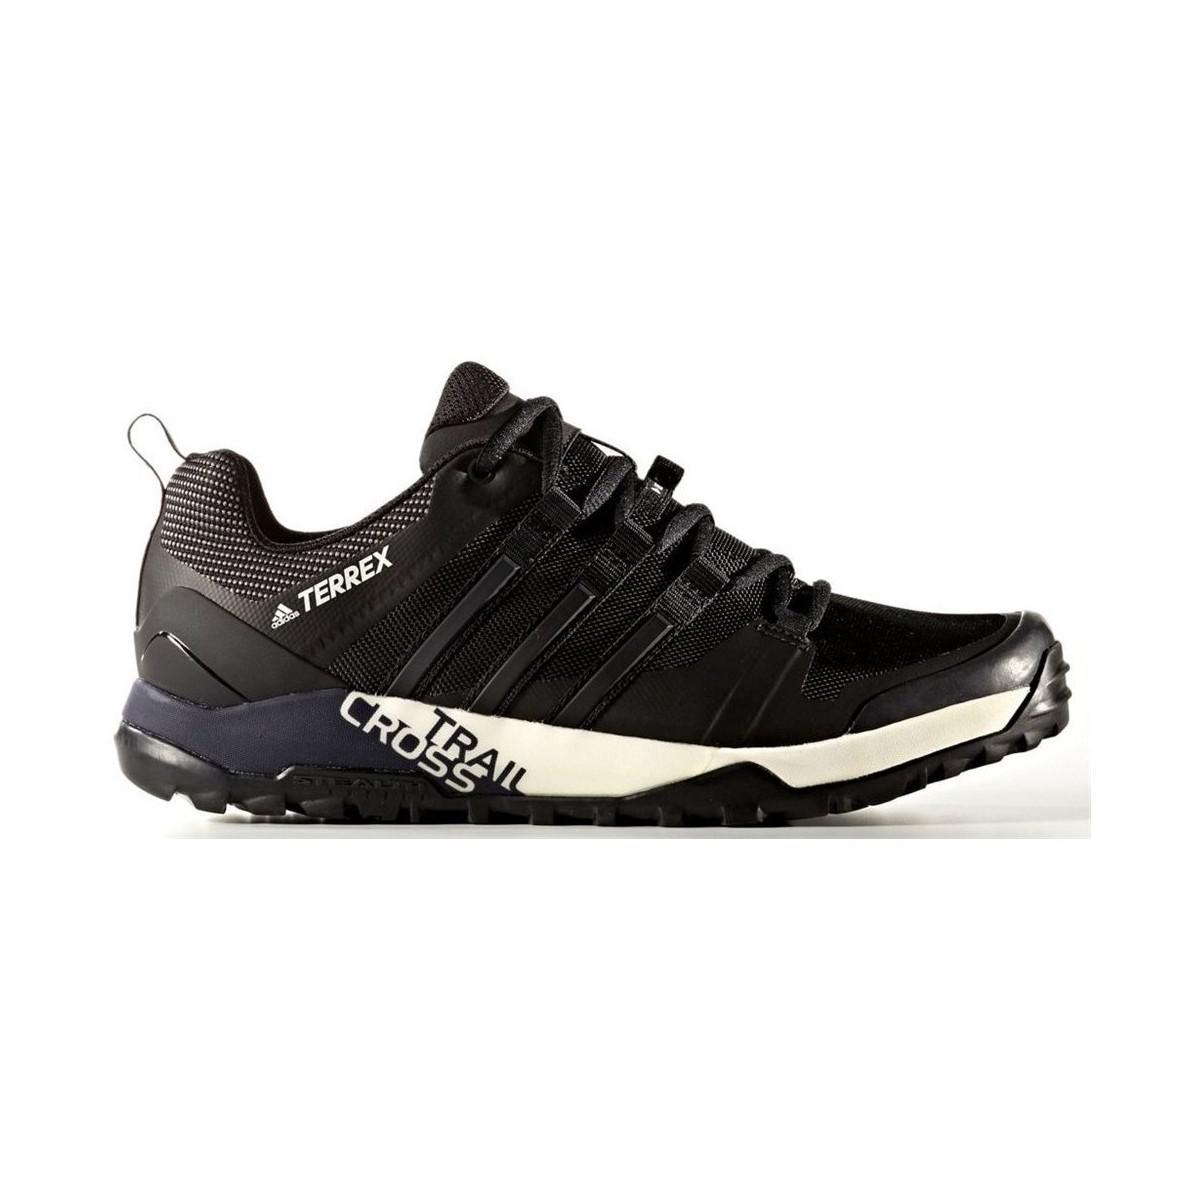 315b5e7325f9 adidas Terrex Trail Cross Sl Men s Shoes (trainers) In Black in ...